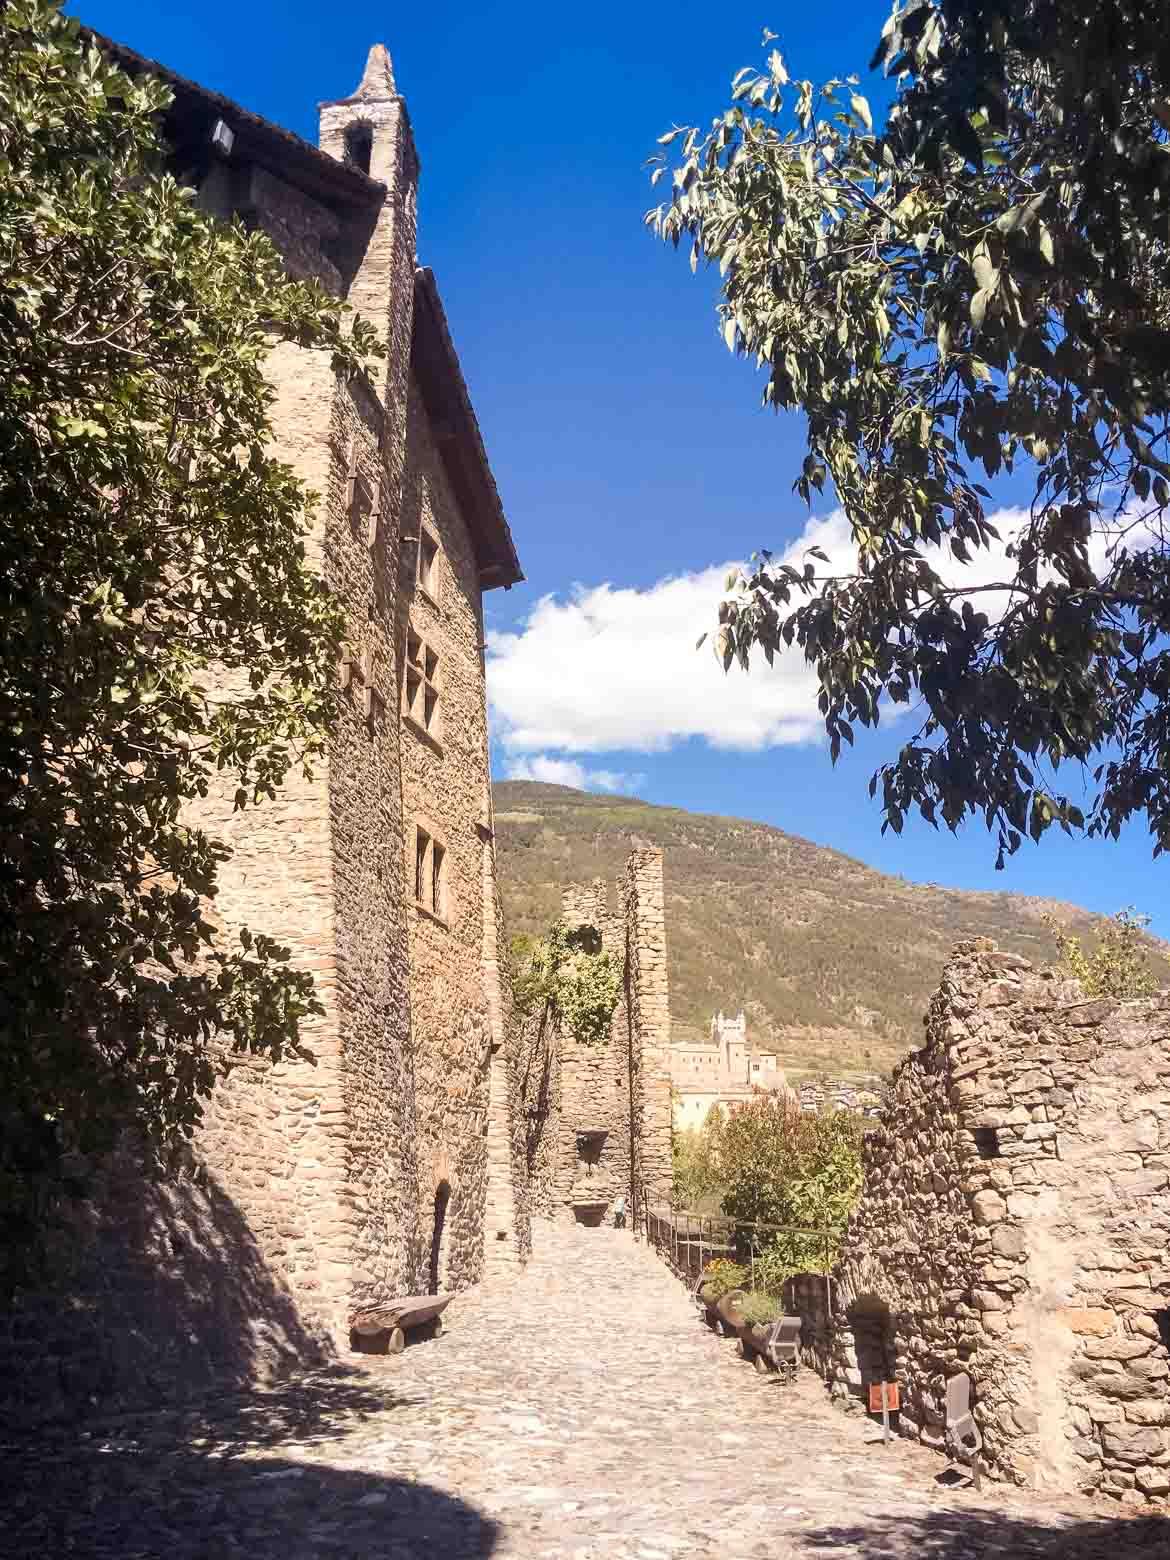 Castello Sarriod Tour ingresso - Valle Aosta - In Viaggio Con Monica